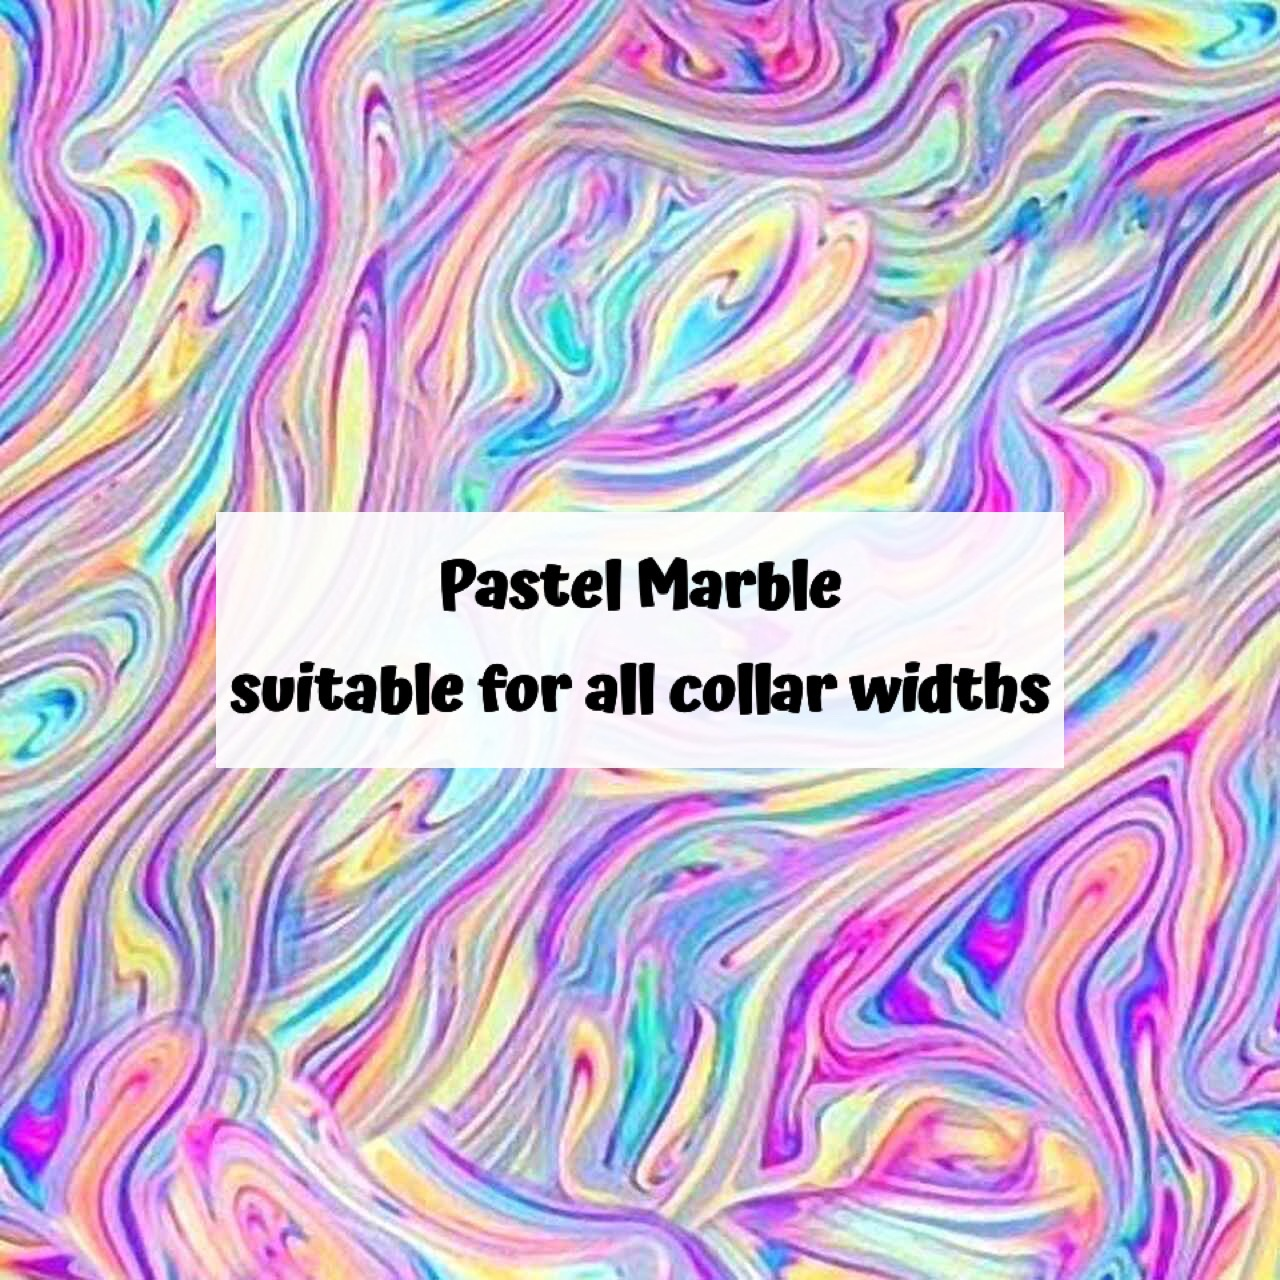 Pastel Marble